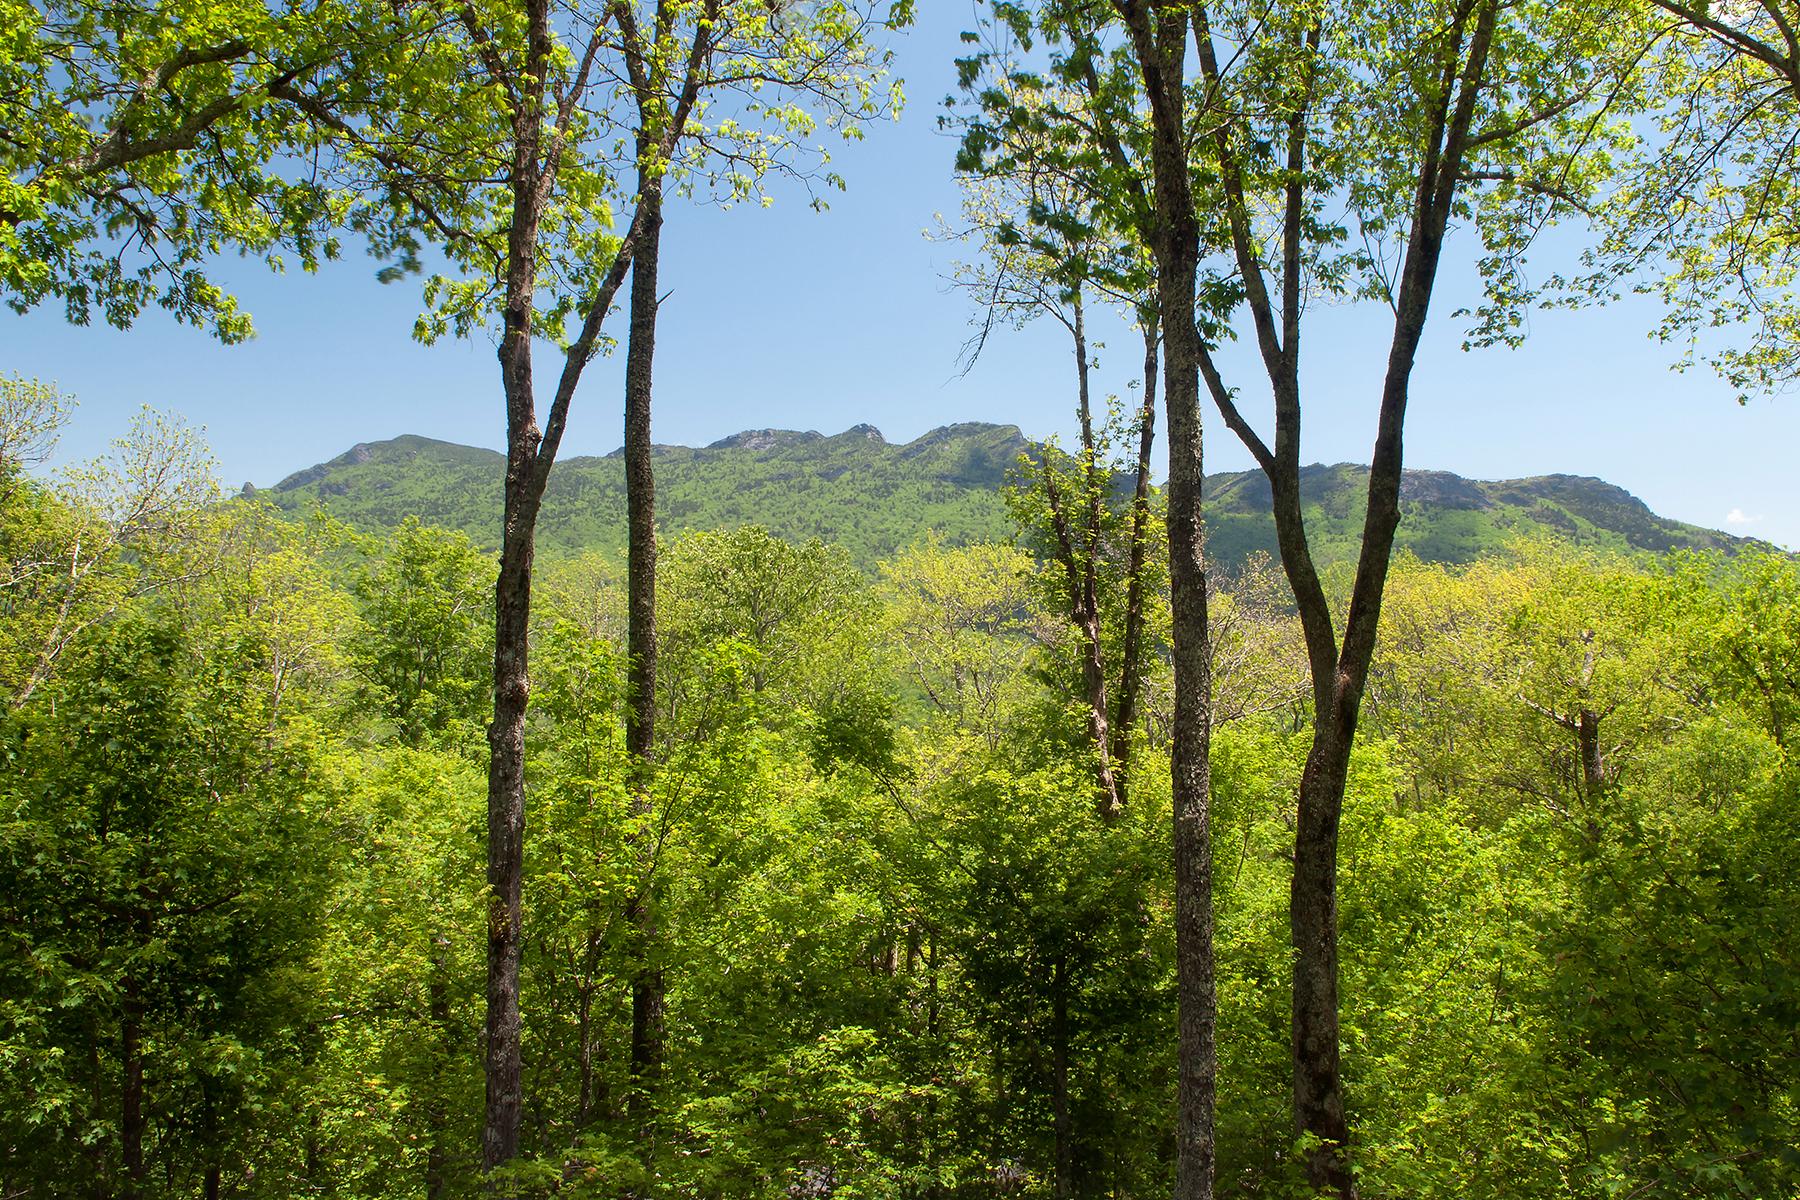 Land for Sale at LINVILLE RIDGE - SPLIT ROCK ESTATES 1729 Forest Ridge Dr, Linville, North Carolina 28646 United States